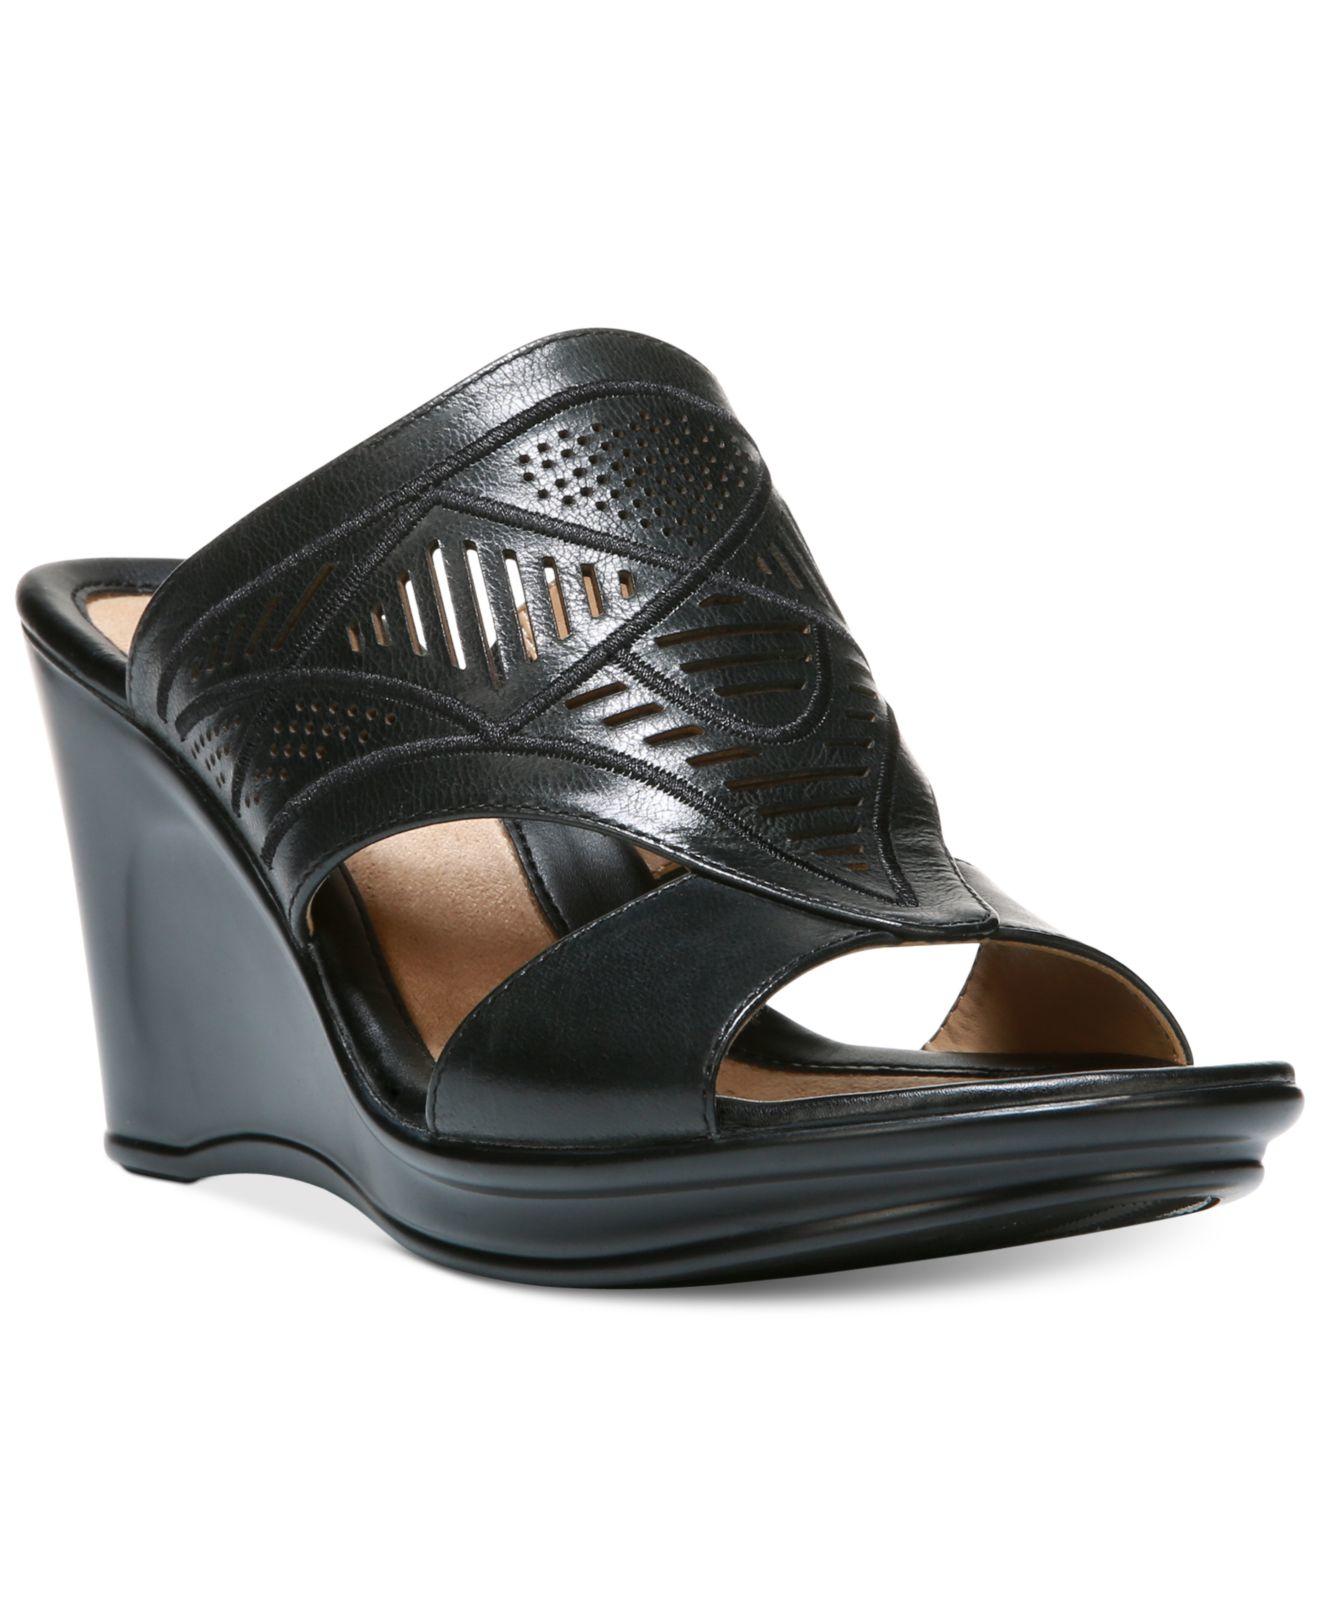 naturalizer oshea open toe wedge sandals in black lyst